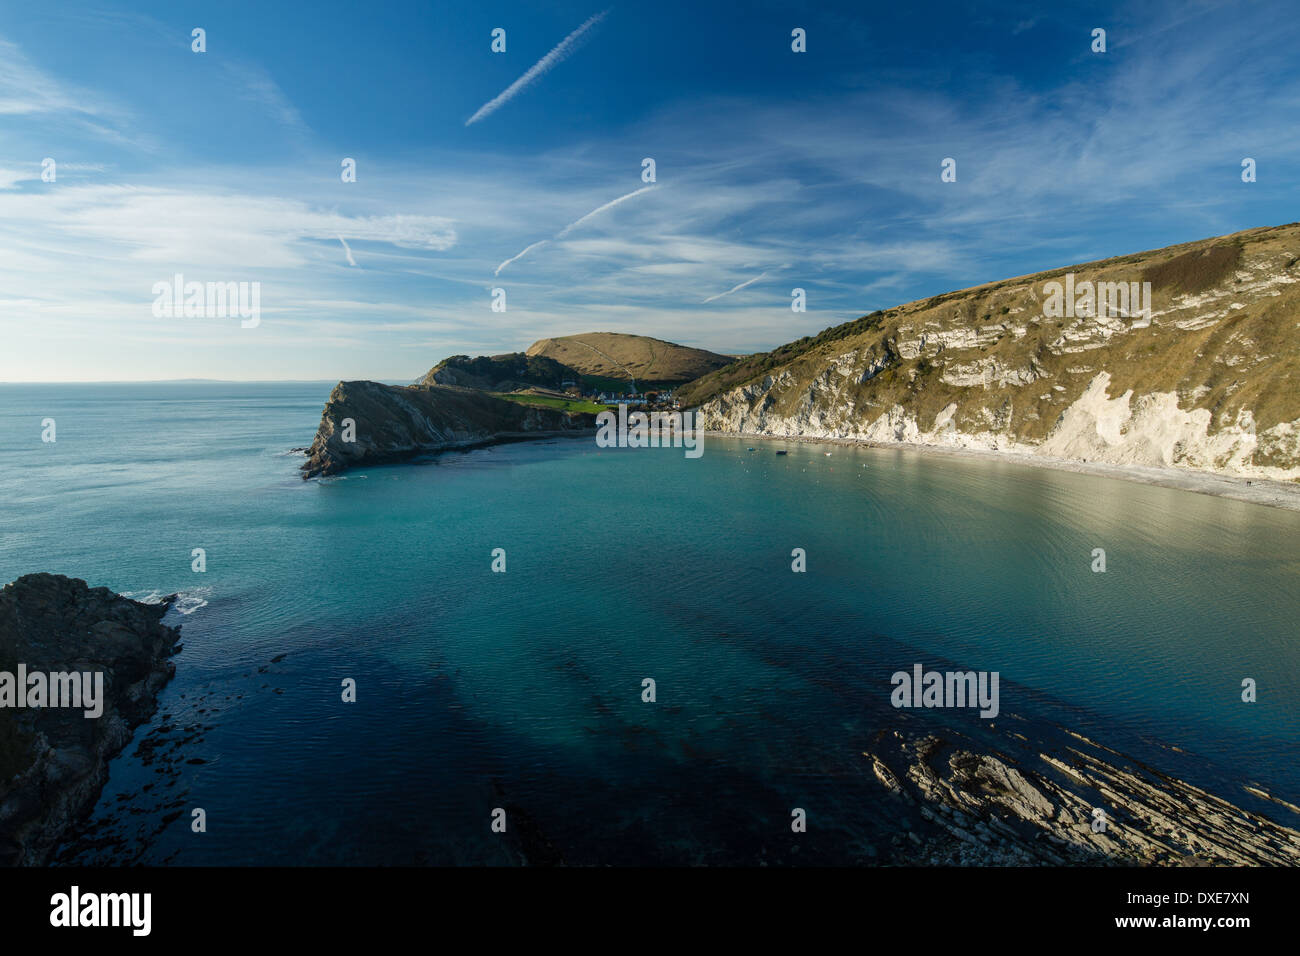 Lulworth Cove, Jurassic Coast, Dorset, Inghilterra Immagini Stock